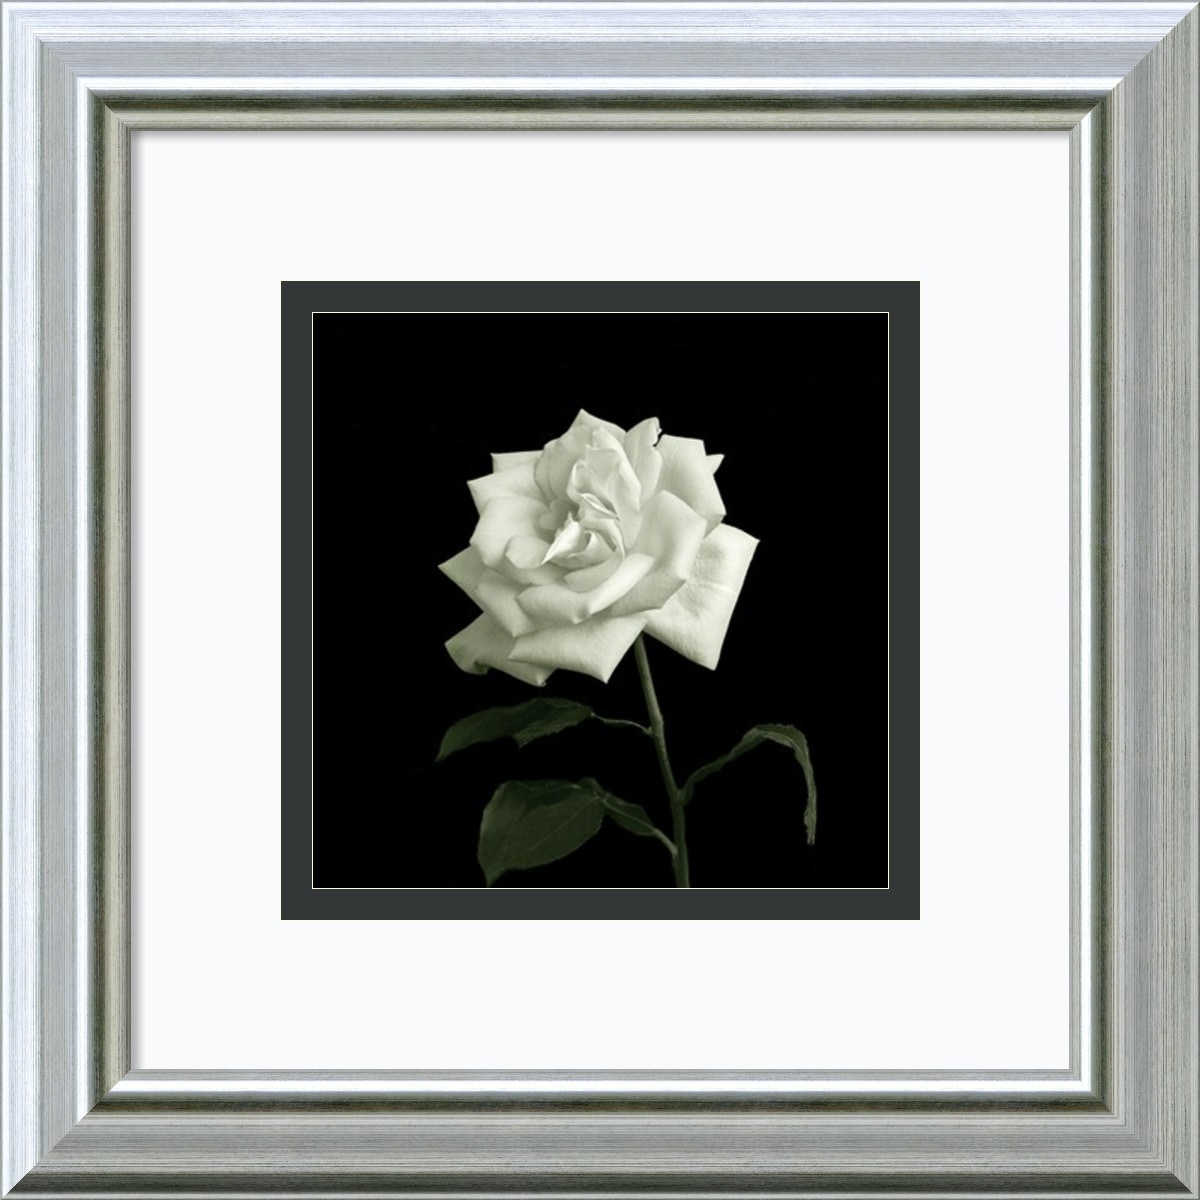 Amanti Art - Walter Gritsik 'Flower Series VIII' Framed Art Print 12 x 12-inch 150529151